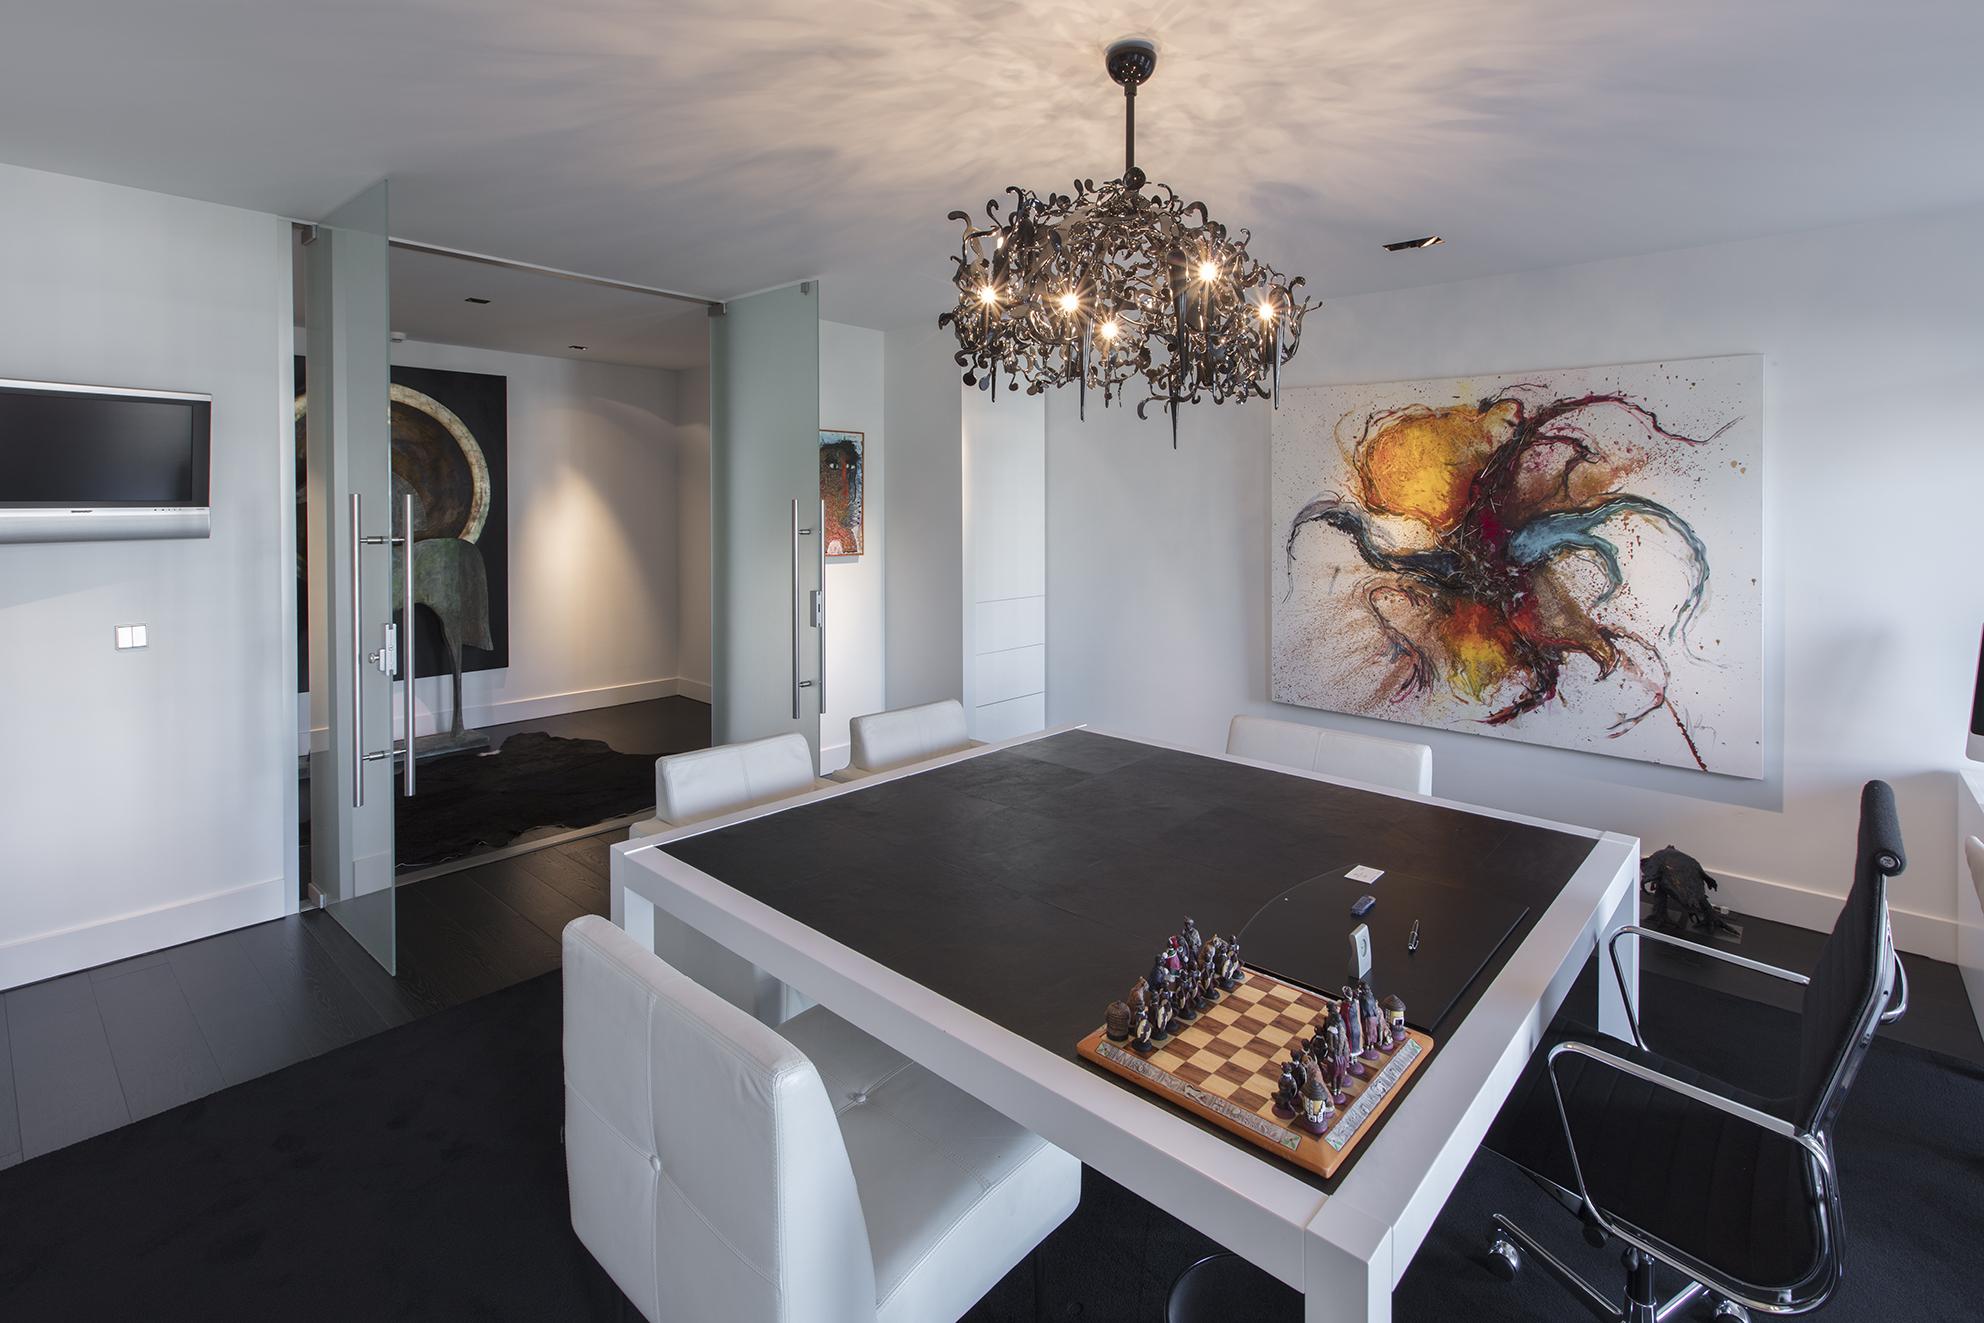 Penthouse Jan des Bouvrie 2 ‹ Interieurfotograaf   Fotograaf ...